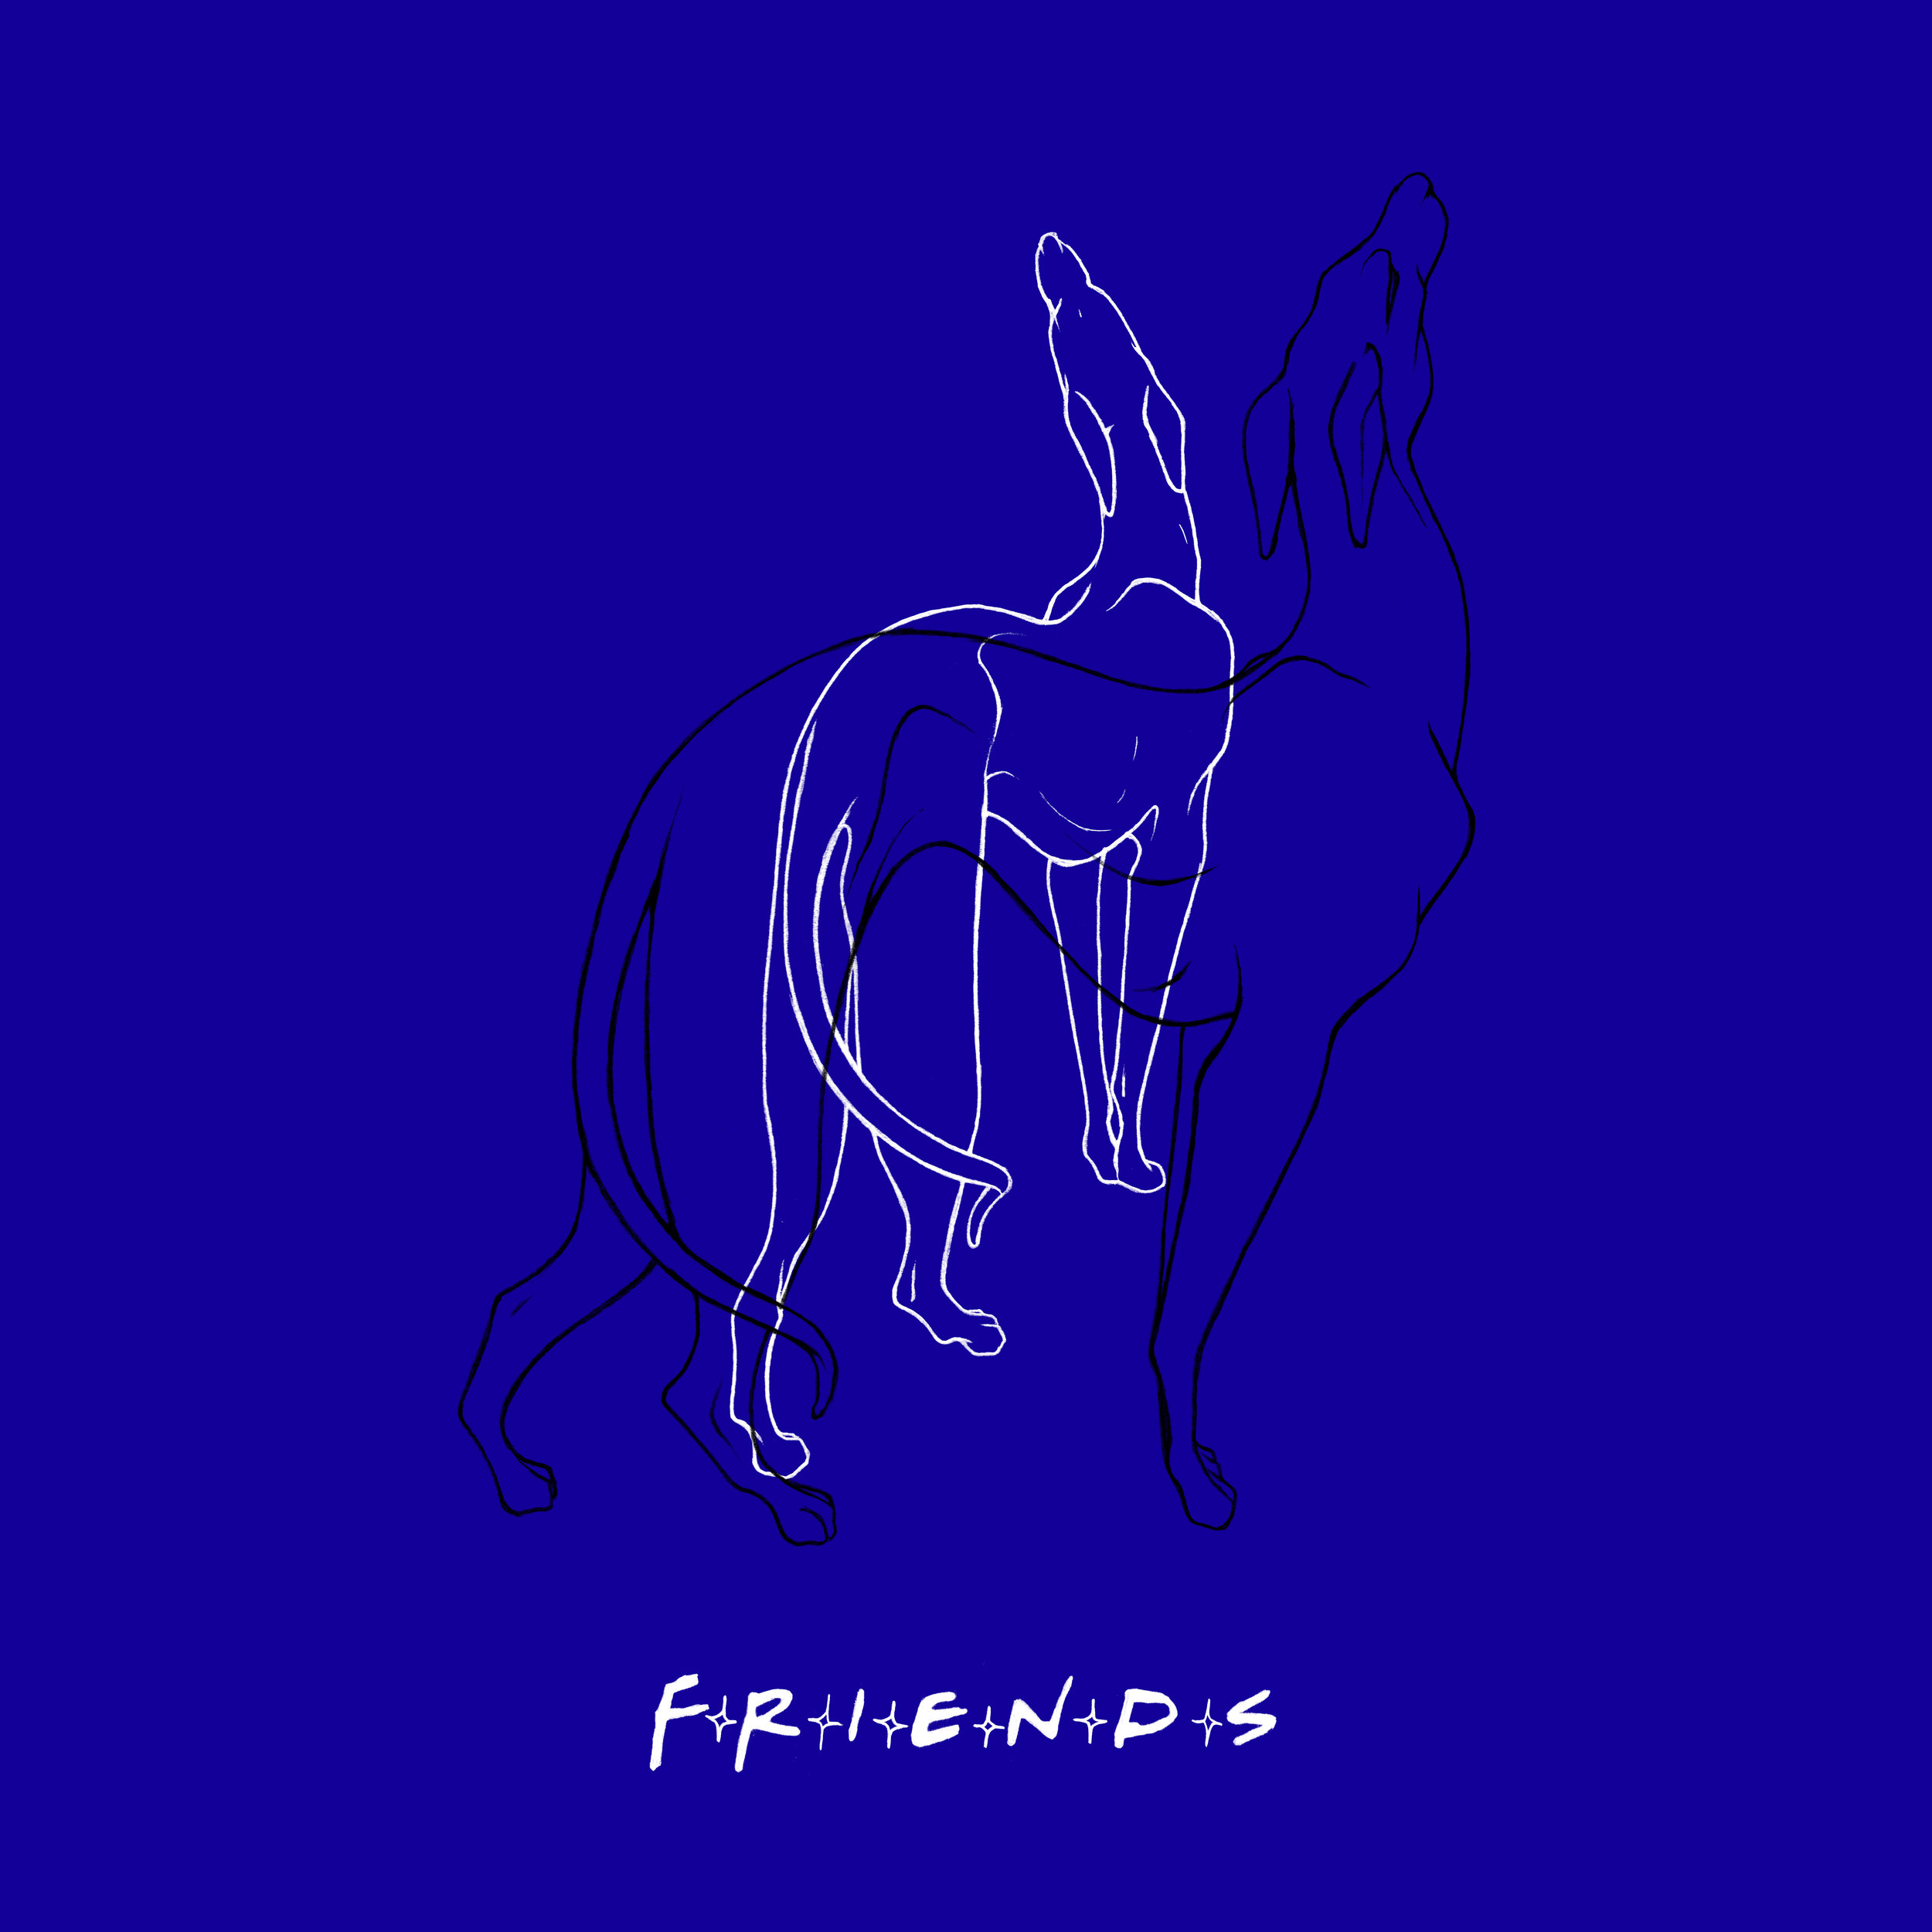 friends 3test.jpg